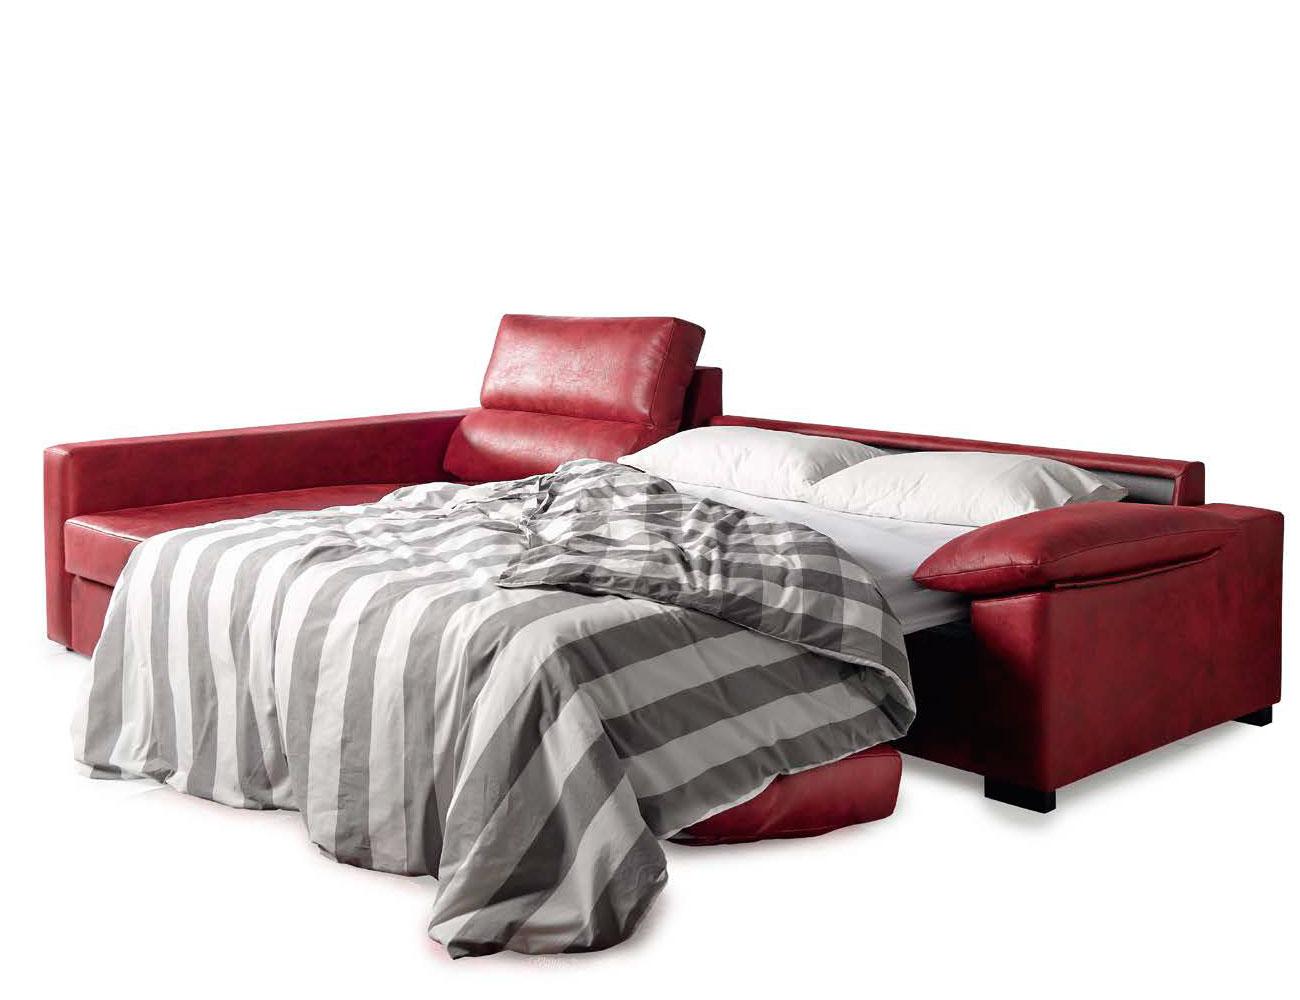 Sofa chaiselongue cama italiana leire rojo 2